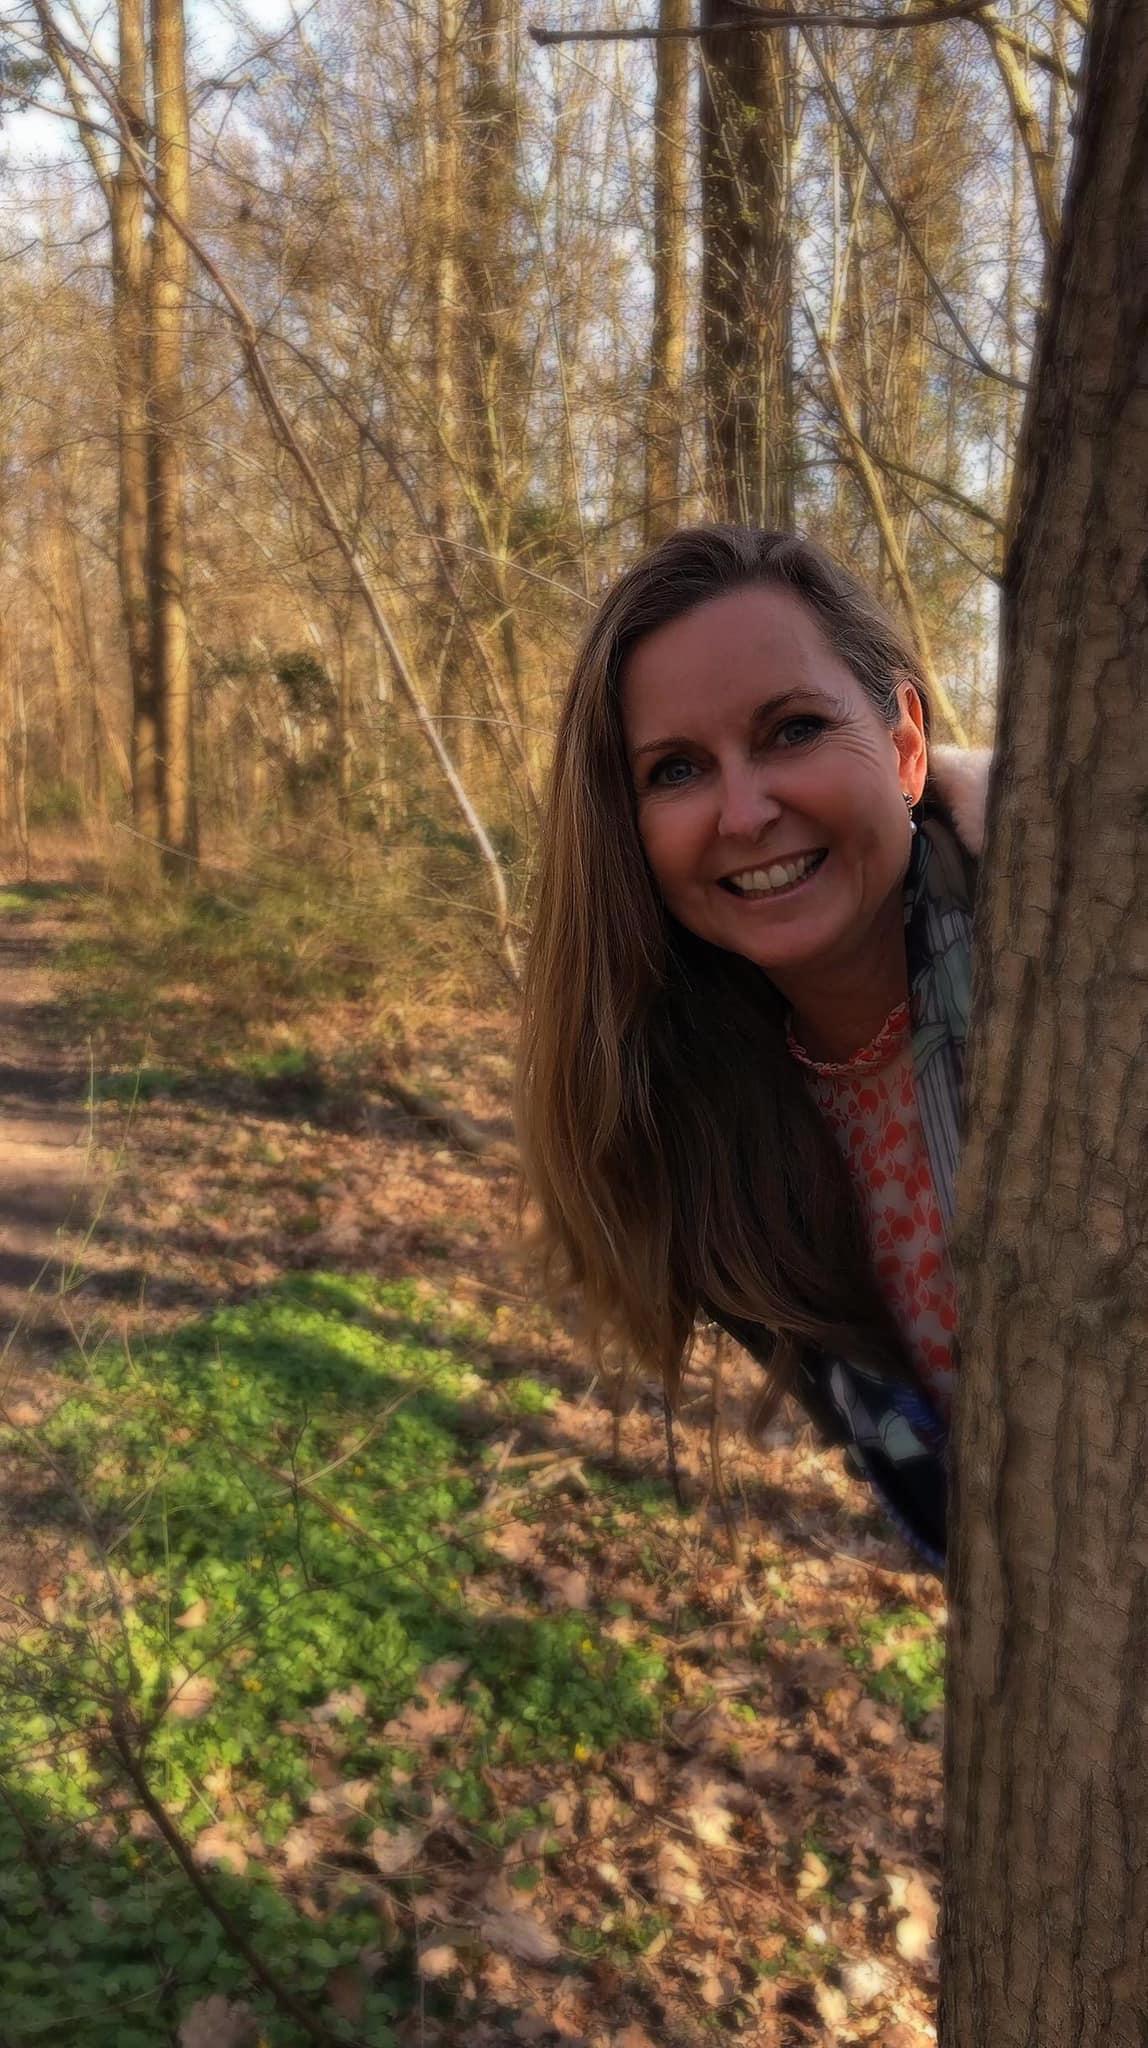 Lone Bornemann   Akupunktur & Healing   Spirituel Udvikling og Meditation